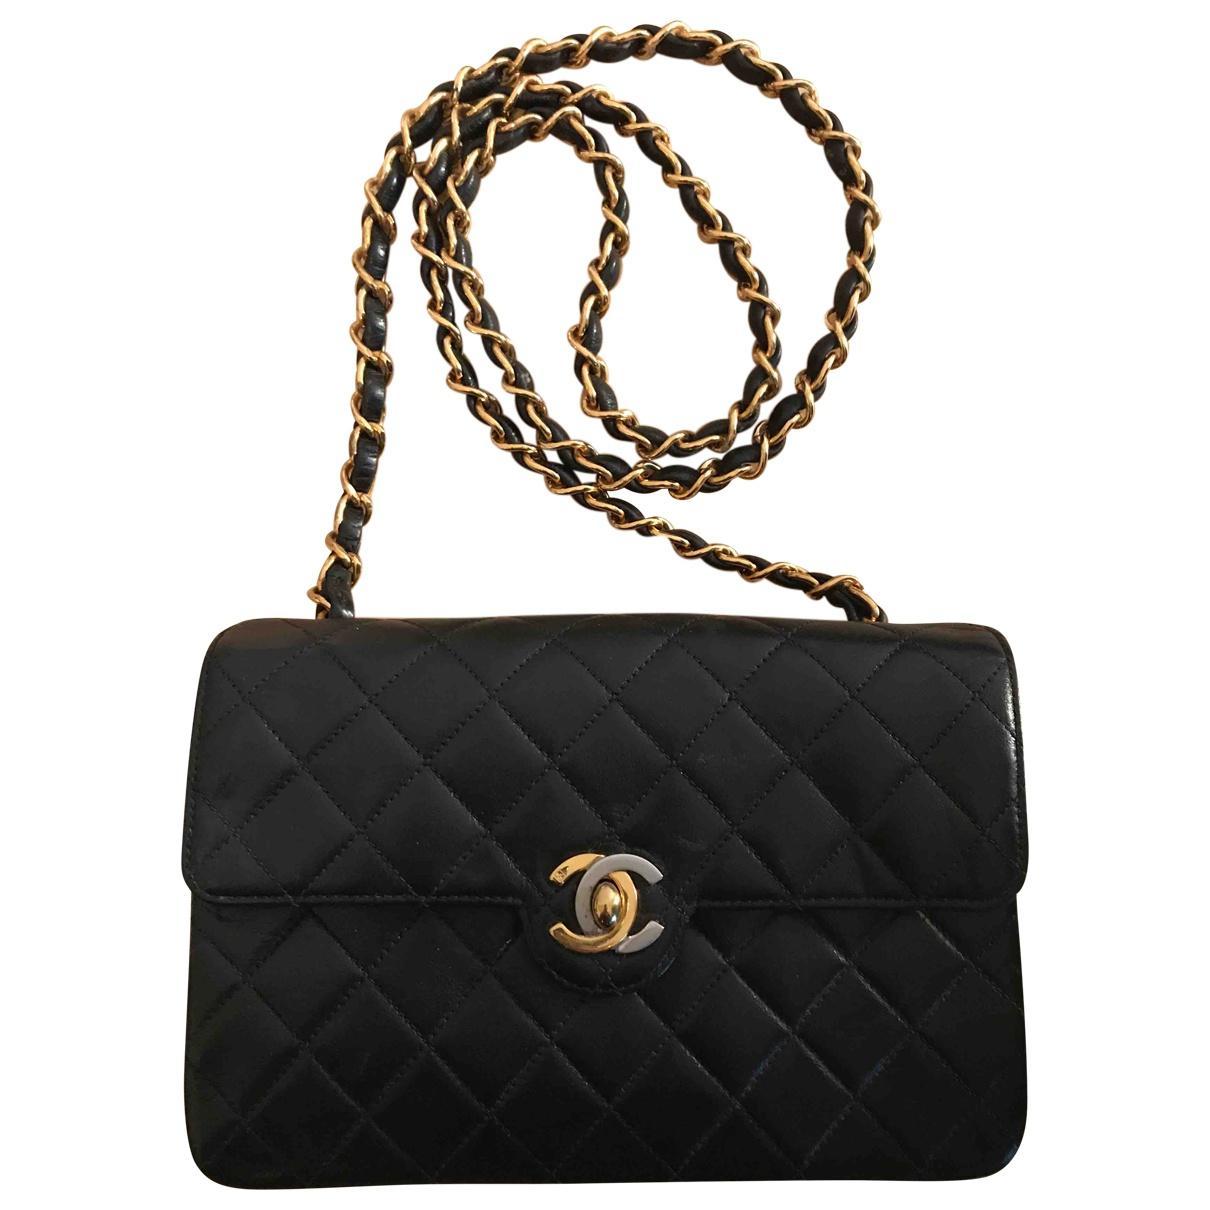 2d6228a825b8 Lyst - Chanel Leather Crossbody Bag in Black